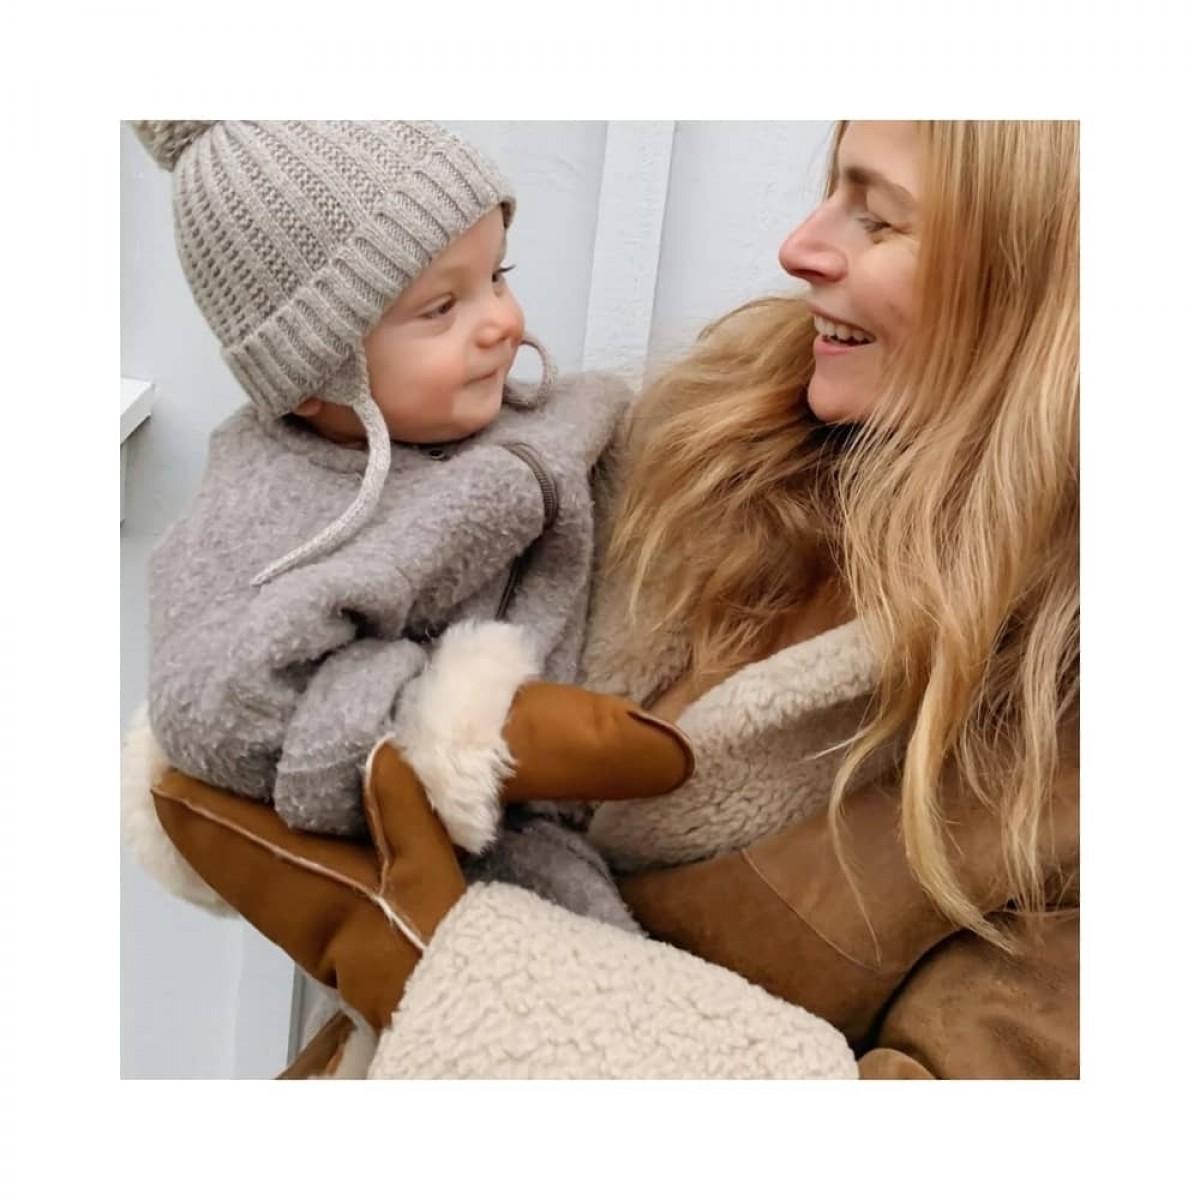 helena heart handske - cognac - model med barn